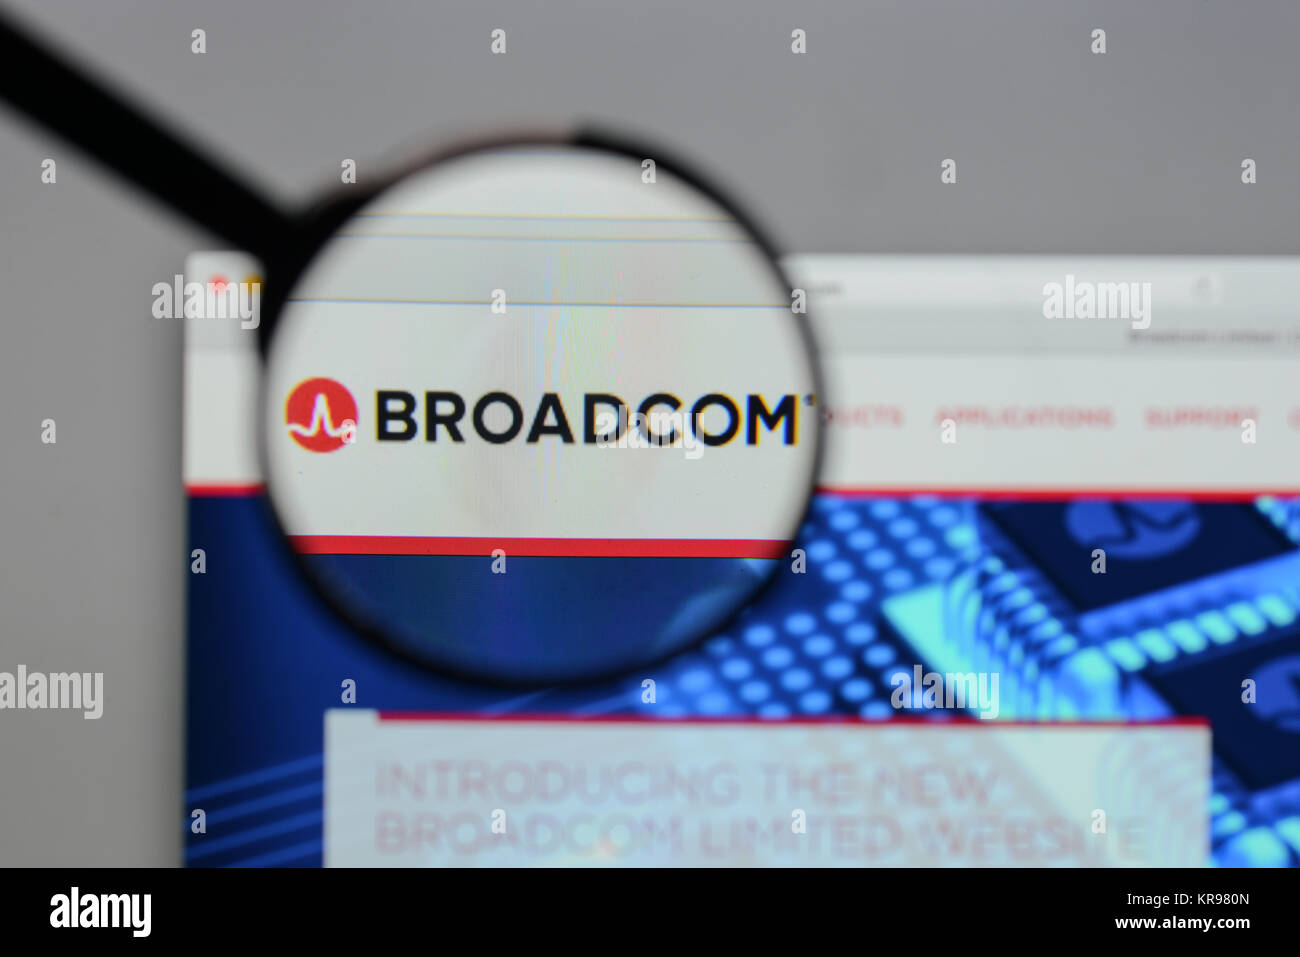 Milan, Italy - August 10, 2017: Broadcom logo on the website